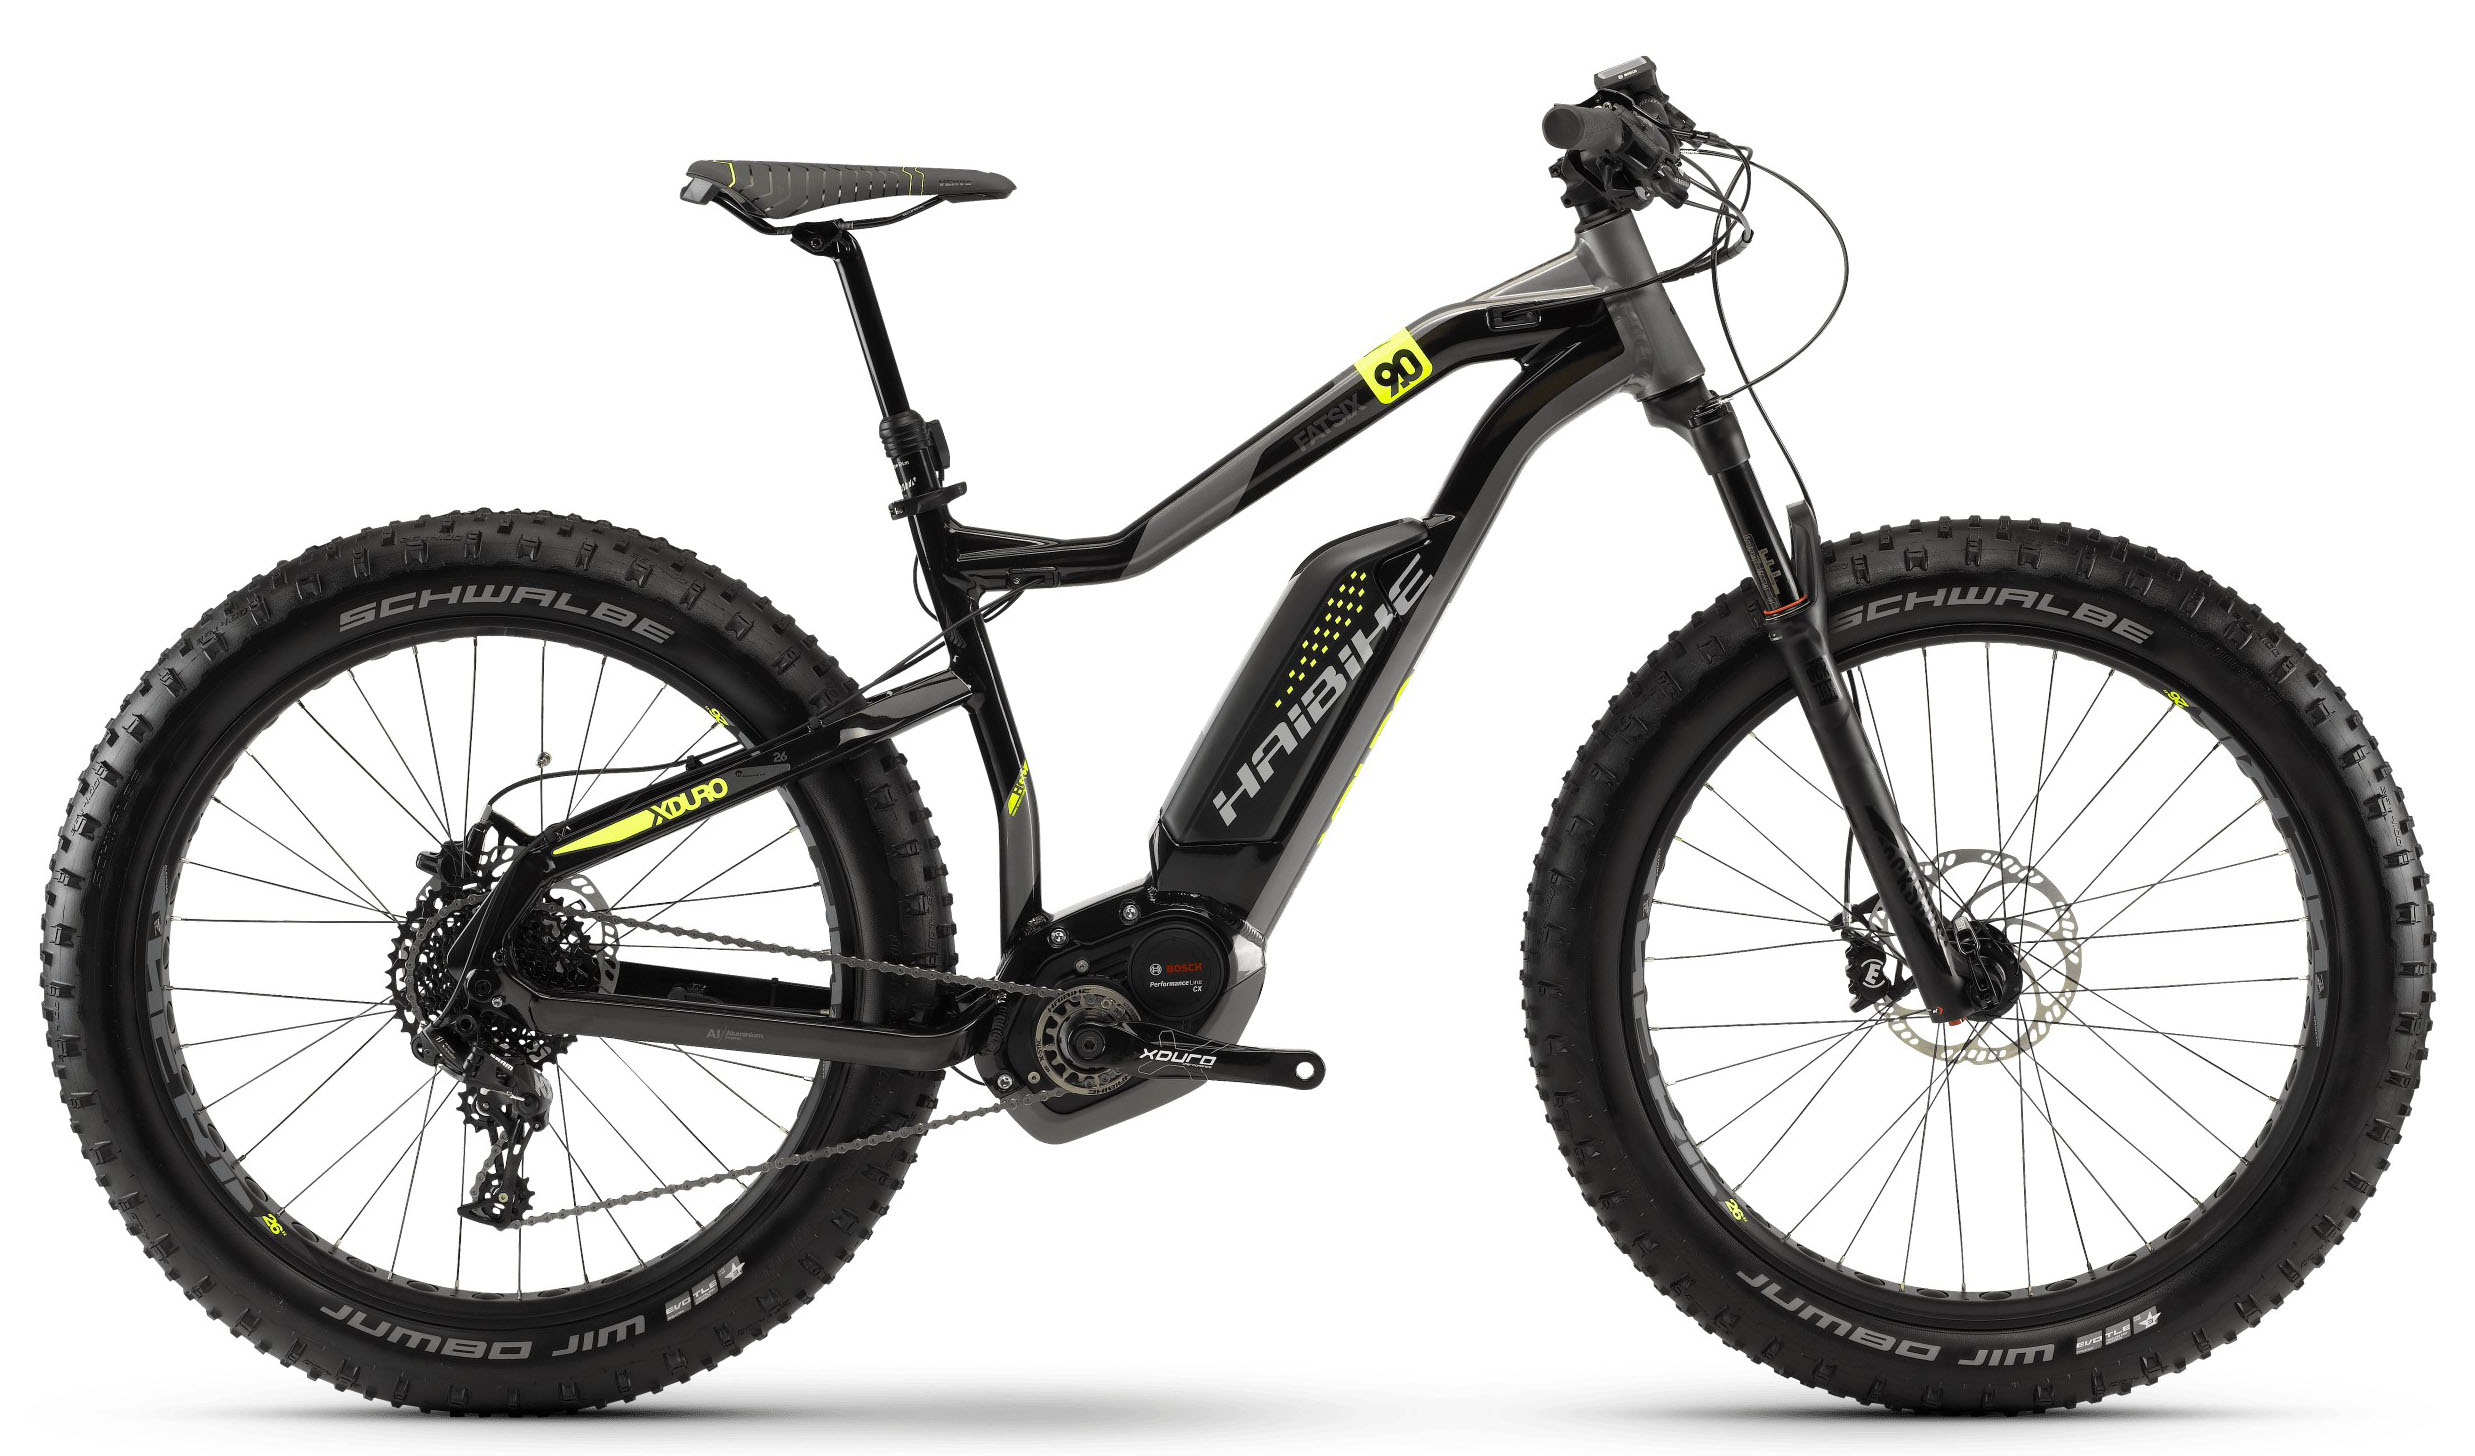 Велосипед Haibike Xduro FatSix 9.0 500Wh 11s NX 2018 велосипед haibike xduro race 2015